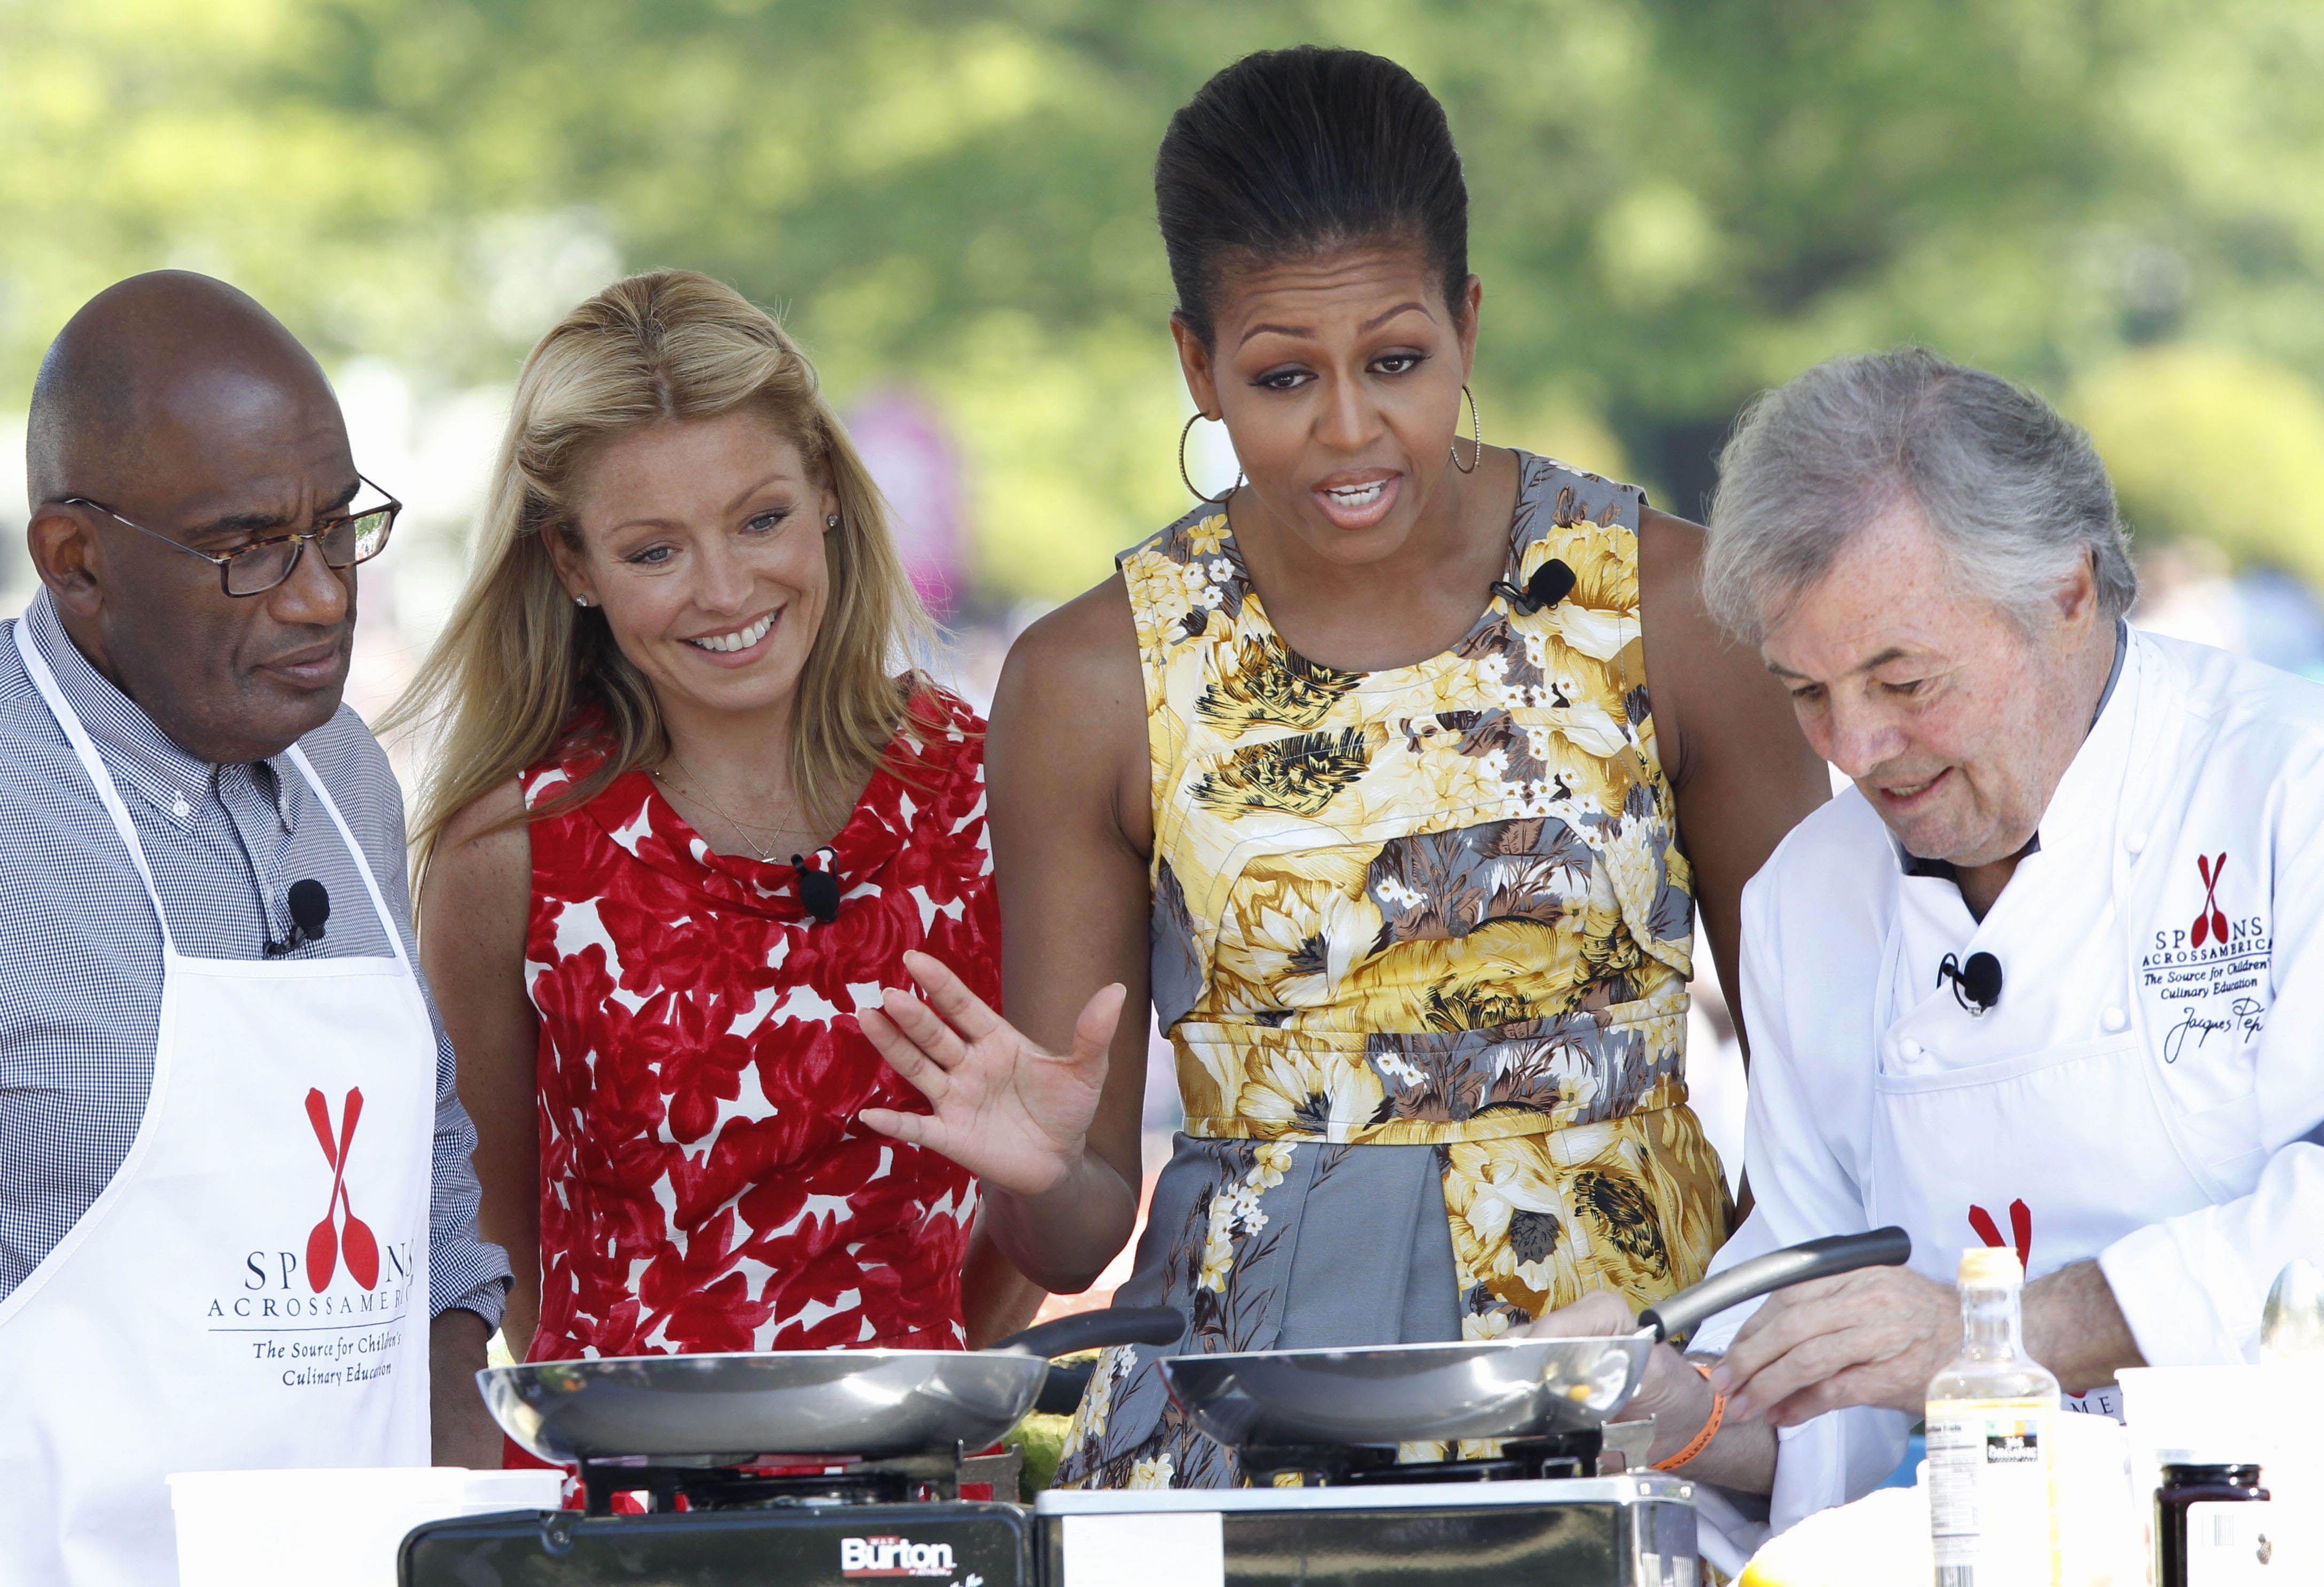 Michelle Obama Jacques Pepin Al Roker Kelly Ripa Kelly Ripa Michelle Obama Jacque Pepin